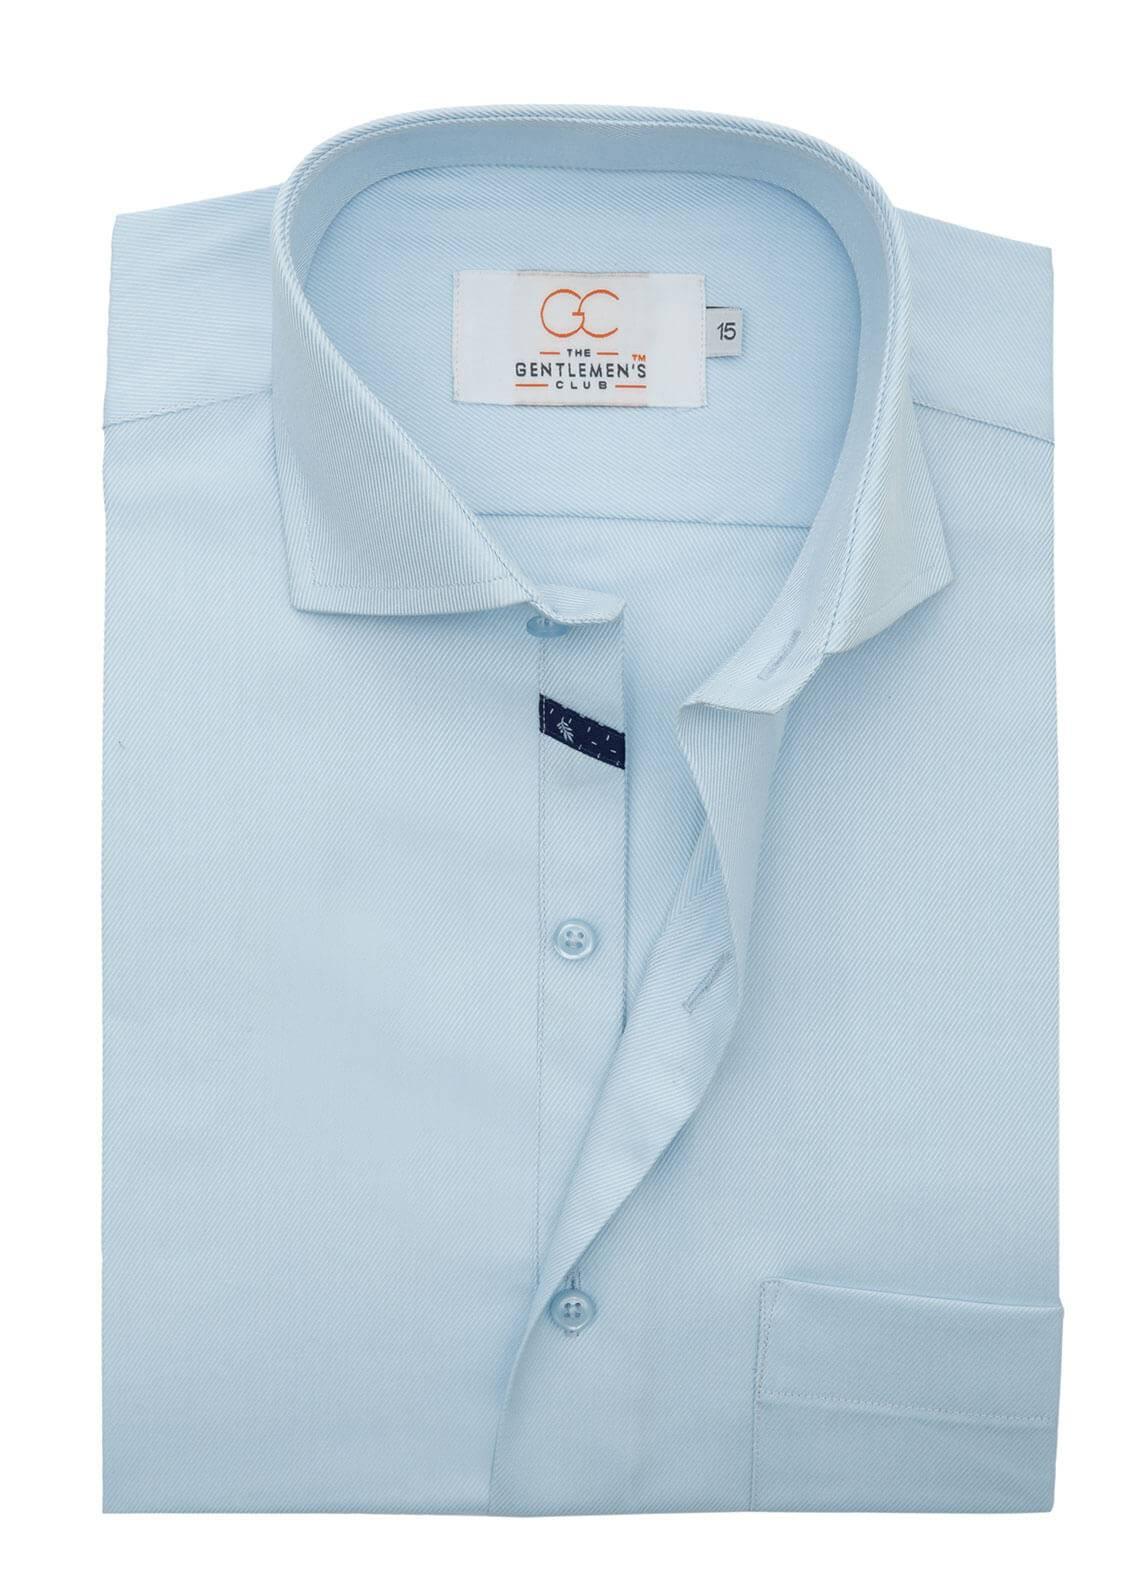 The Gentlemen's Club Cotton Formal Shirts for Men - Sky Blue White Label 4082 - 18